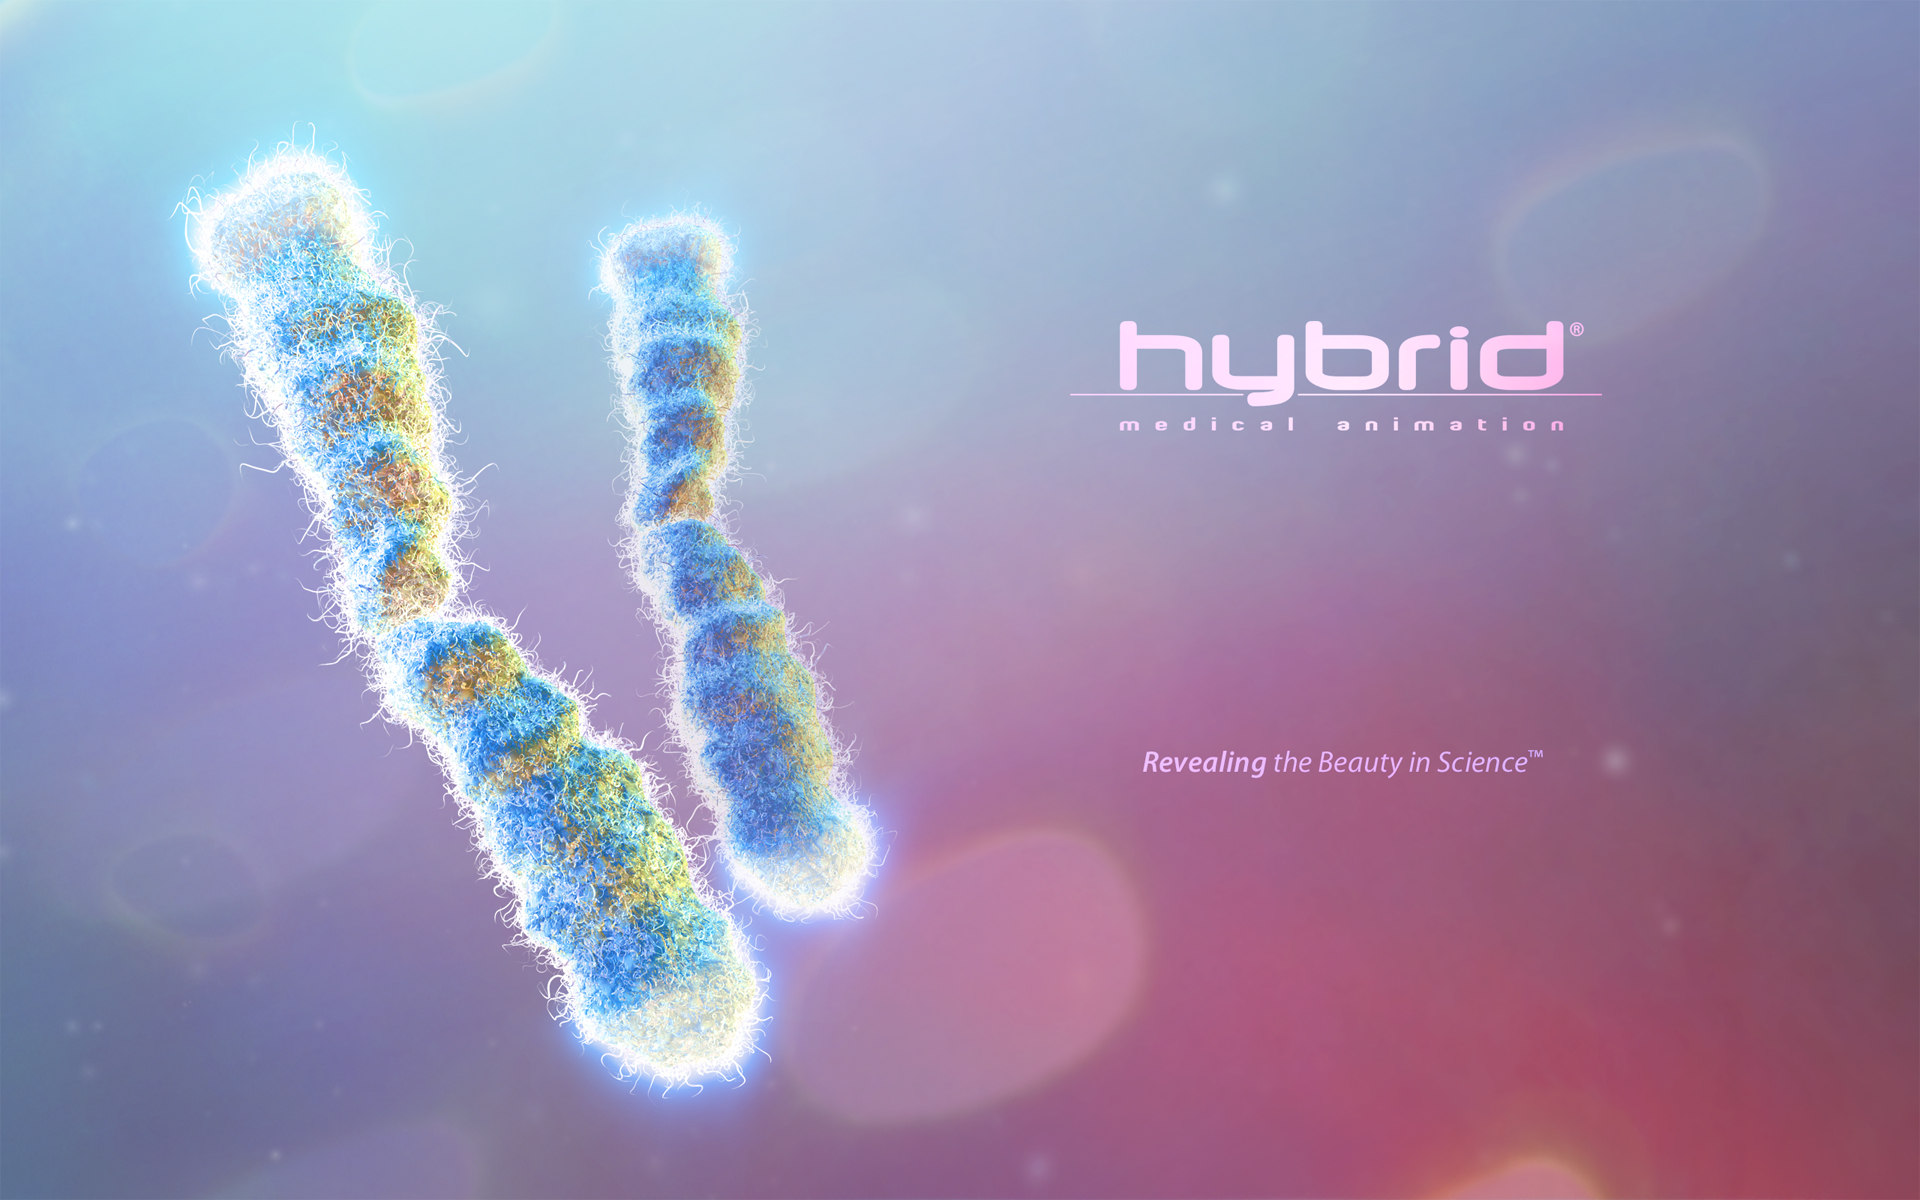 Hybrid Medical Animation   Hybrid Desktop Wallpapers 1920x1200